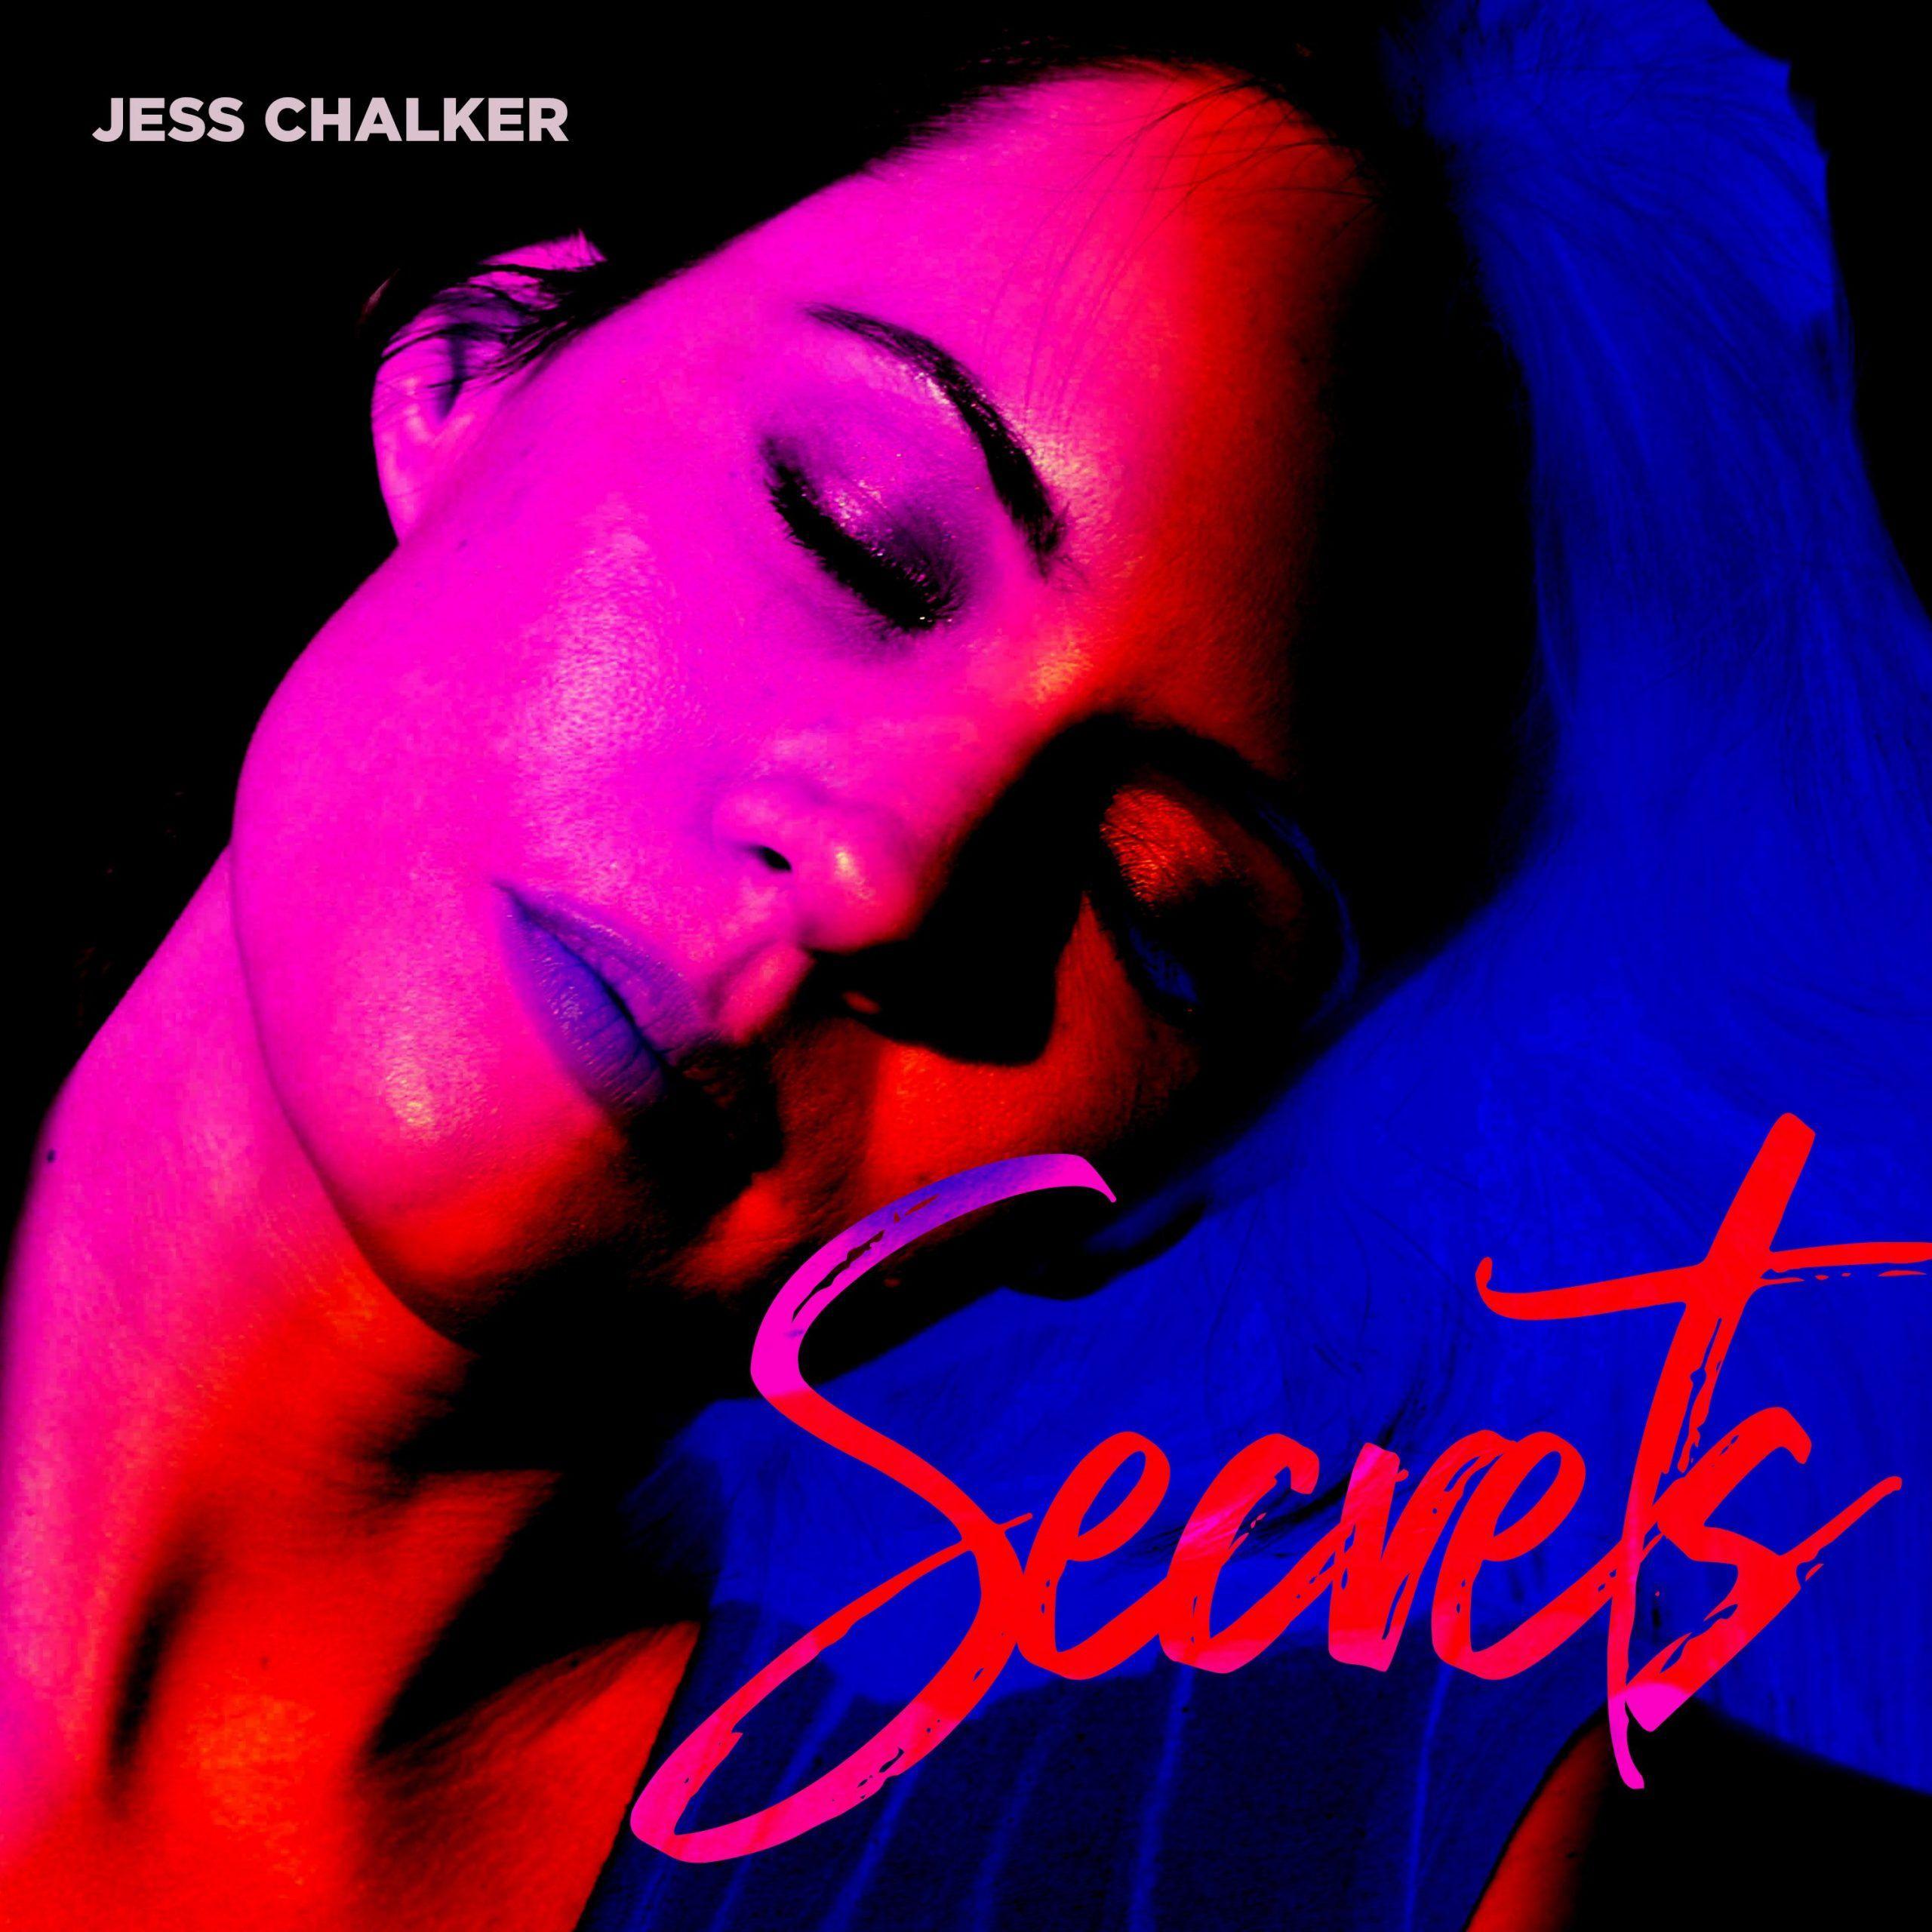 jess-chalker-secrets-artwork-scaled.jpg